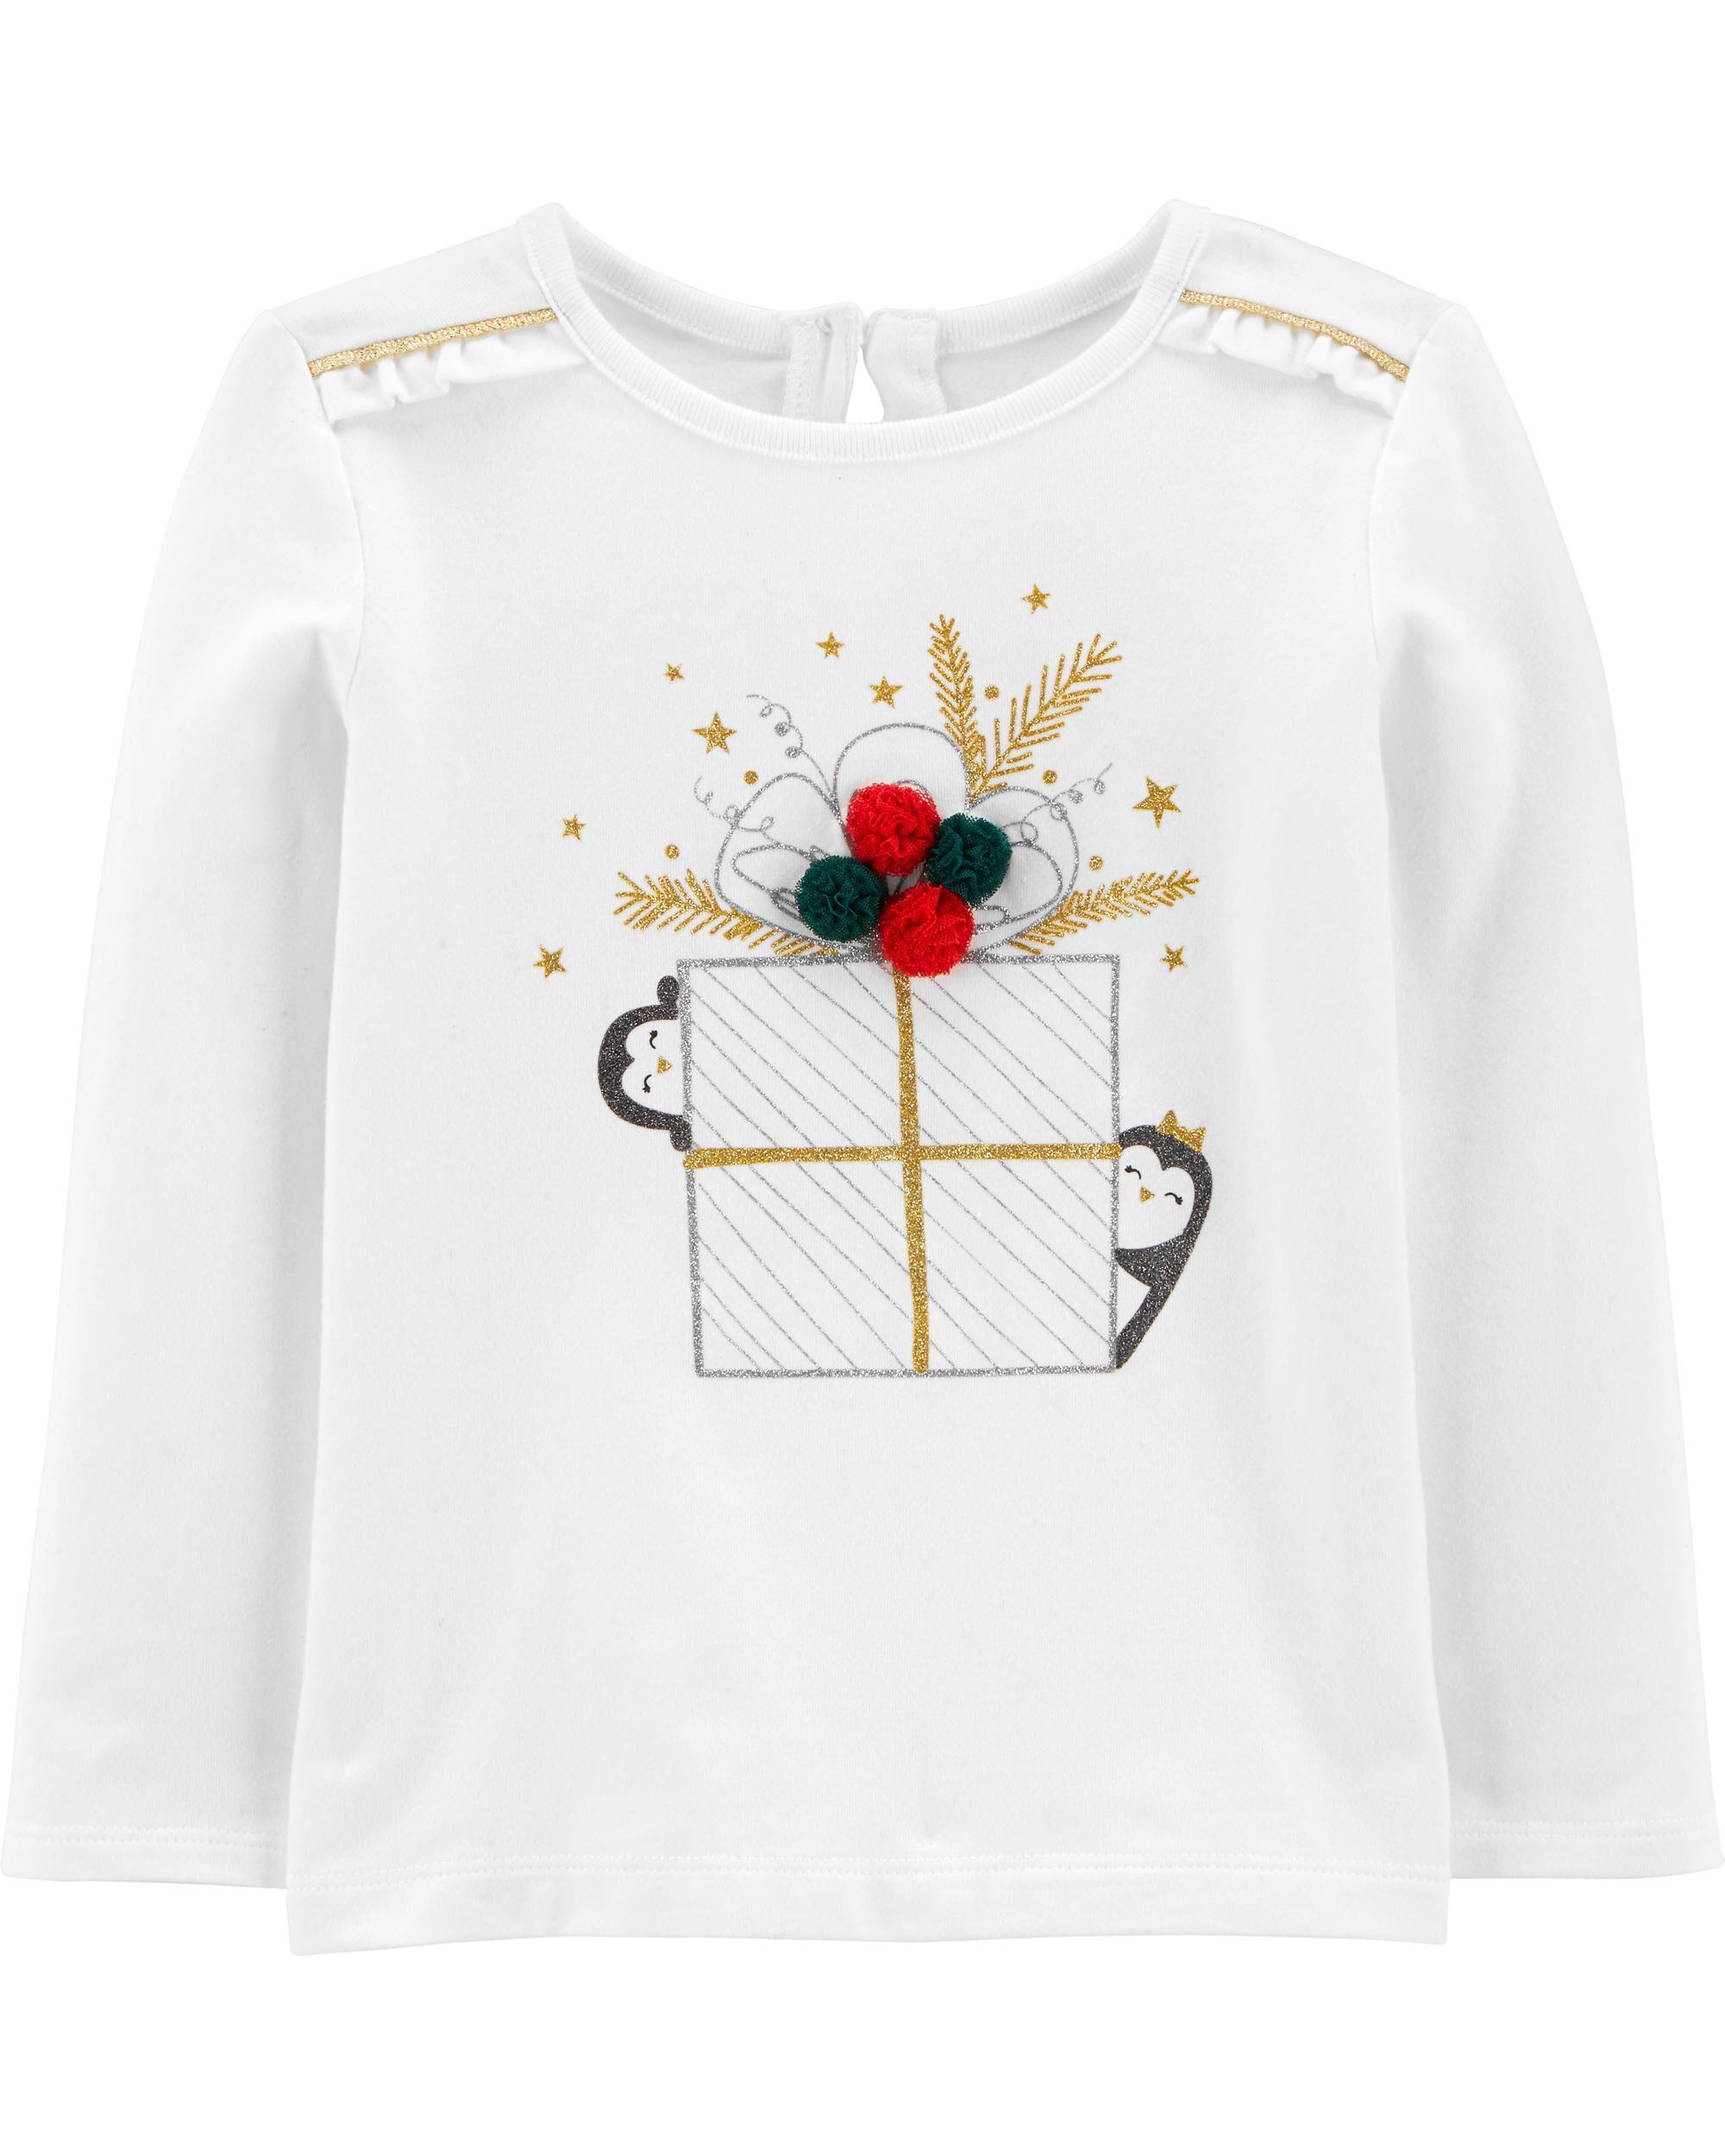 *CLEARANCE* Christmas Jersey Tee